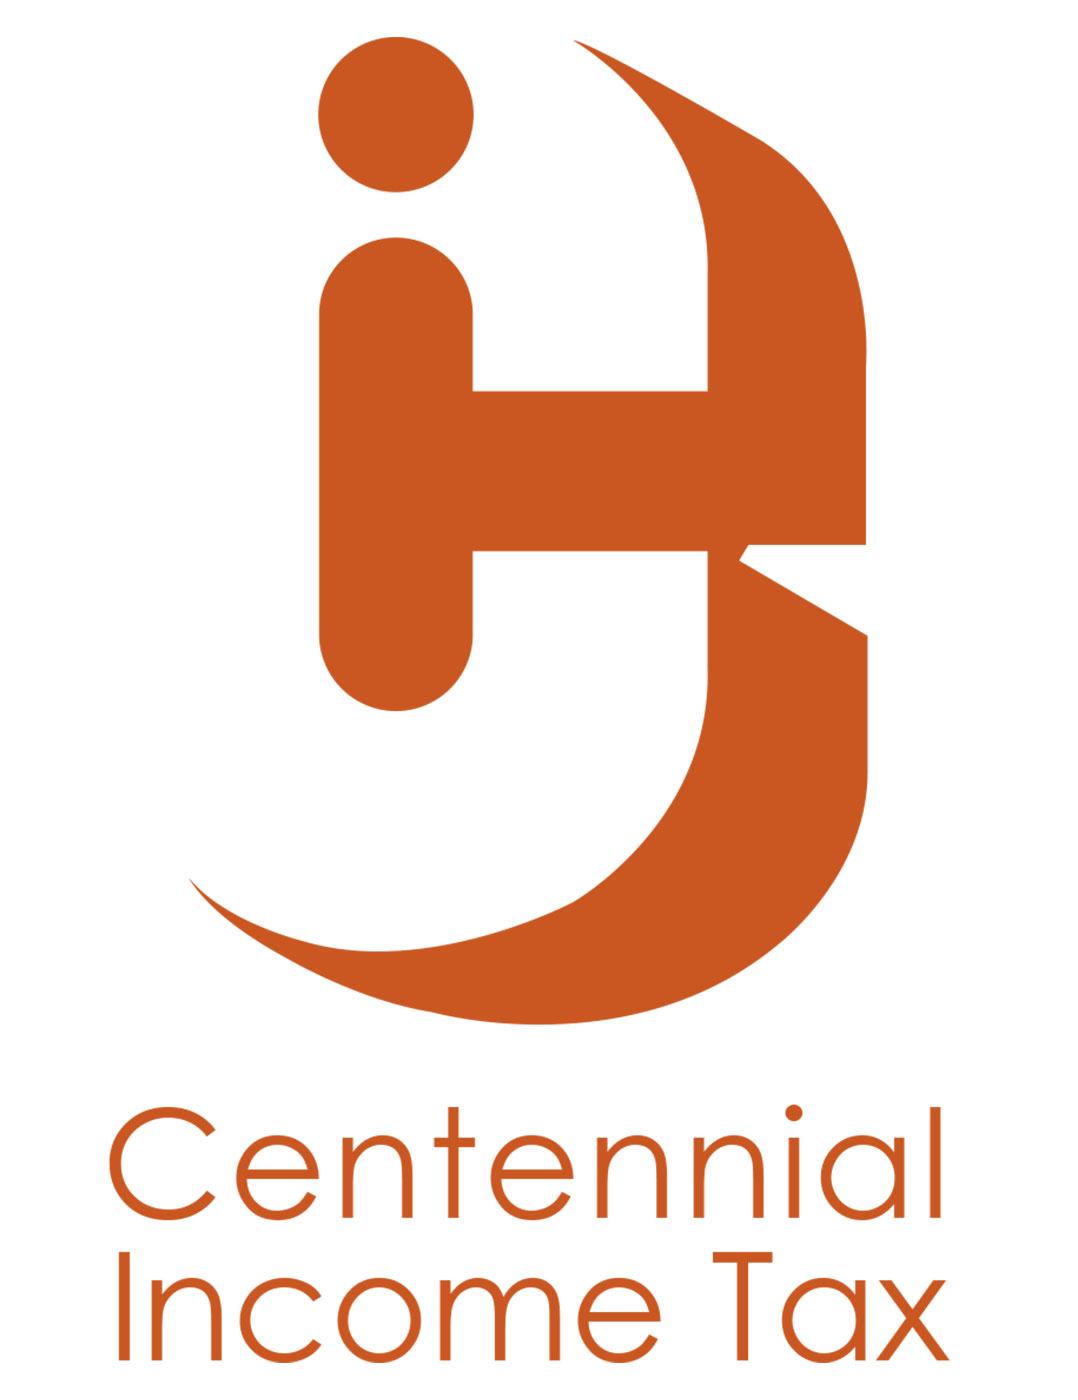 Logo for afforable Tax preparation service in El Paso TX